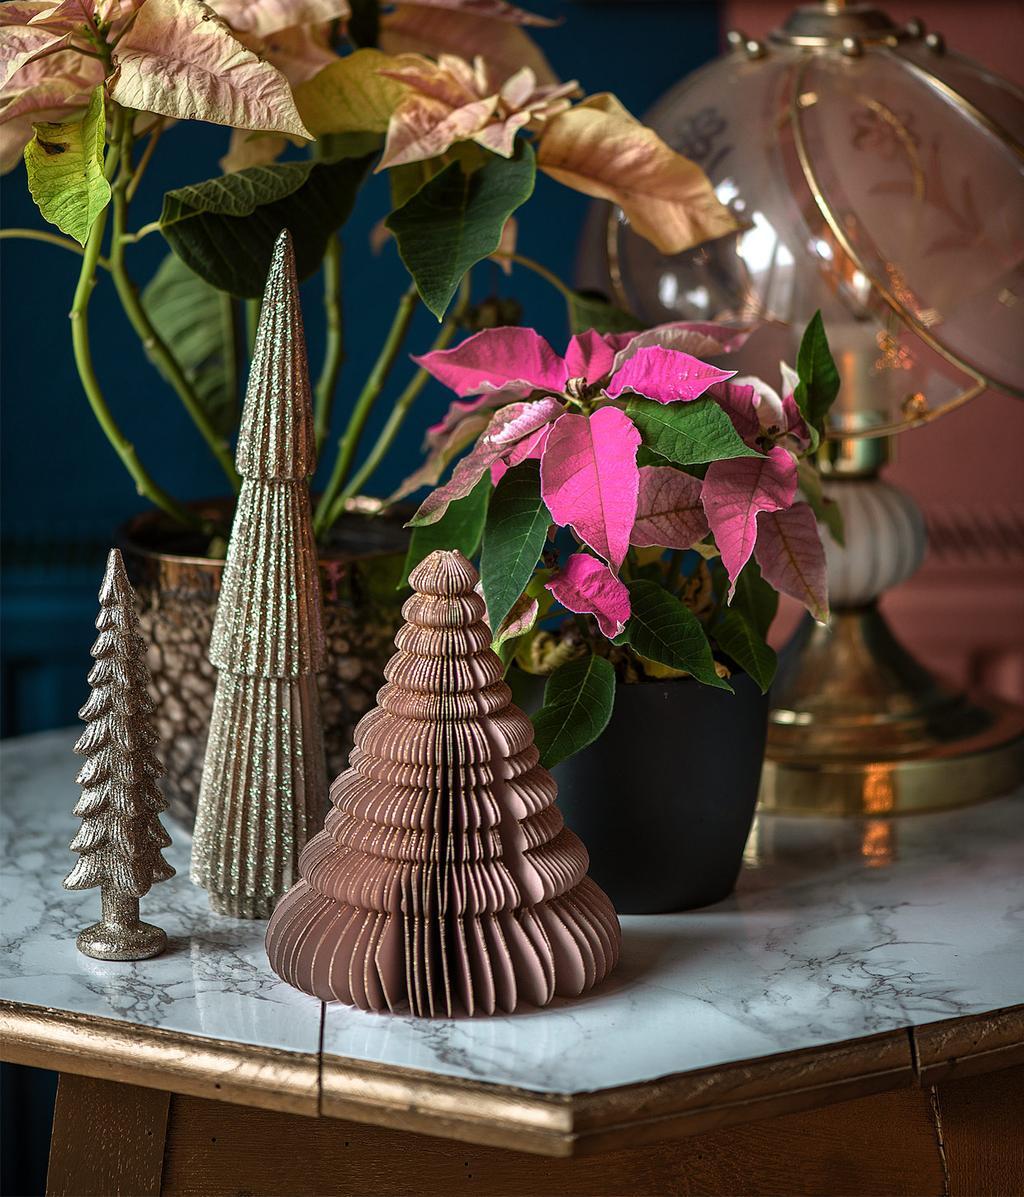 Kerstdecoraties | vtwonen 12-2020